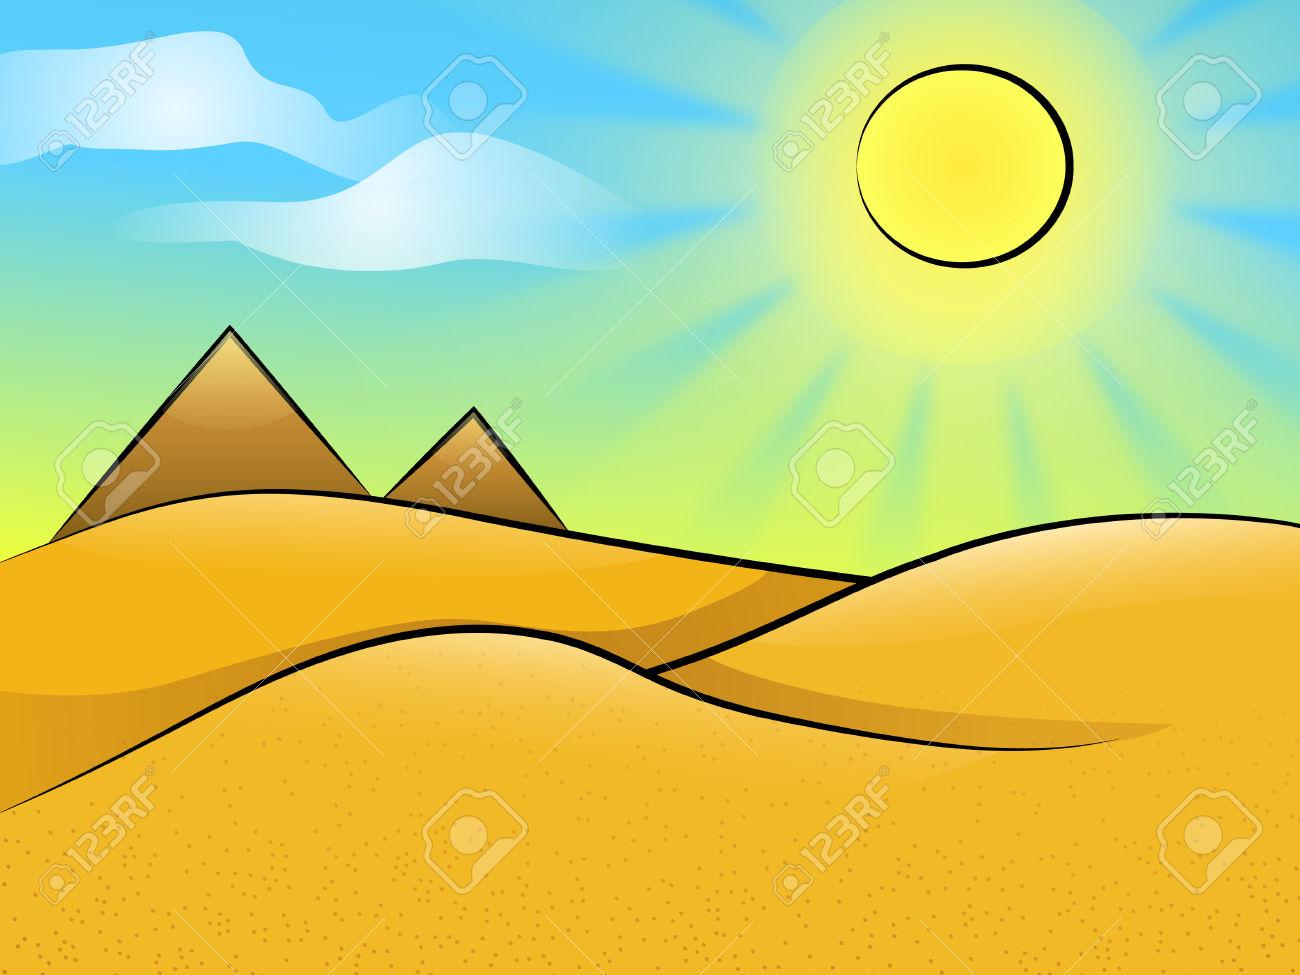 Free cliparts download clip. Sunny clipart desert